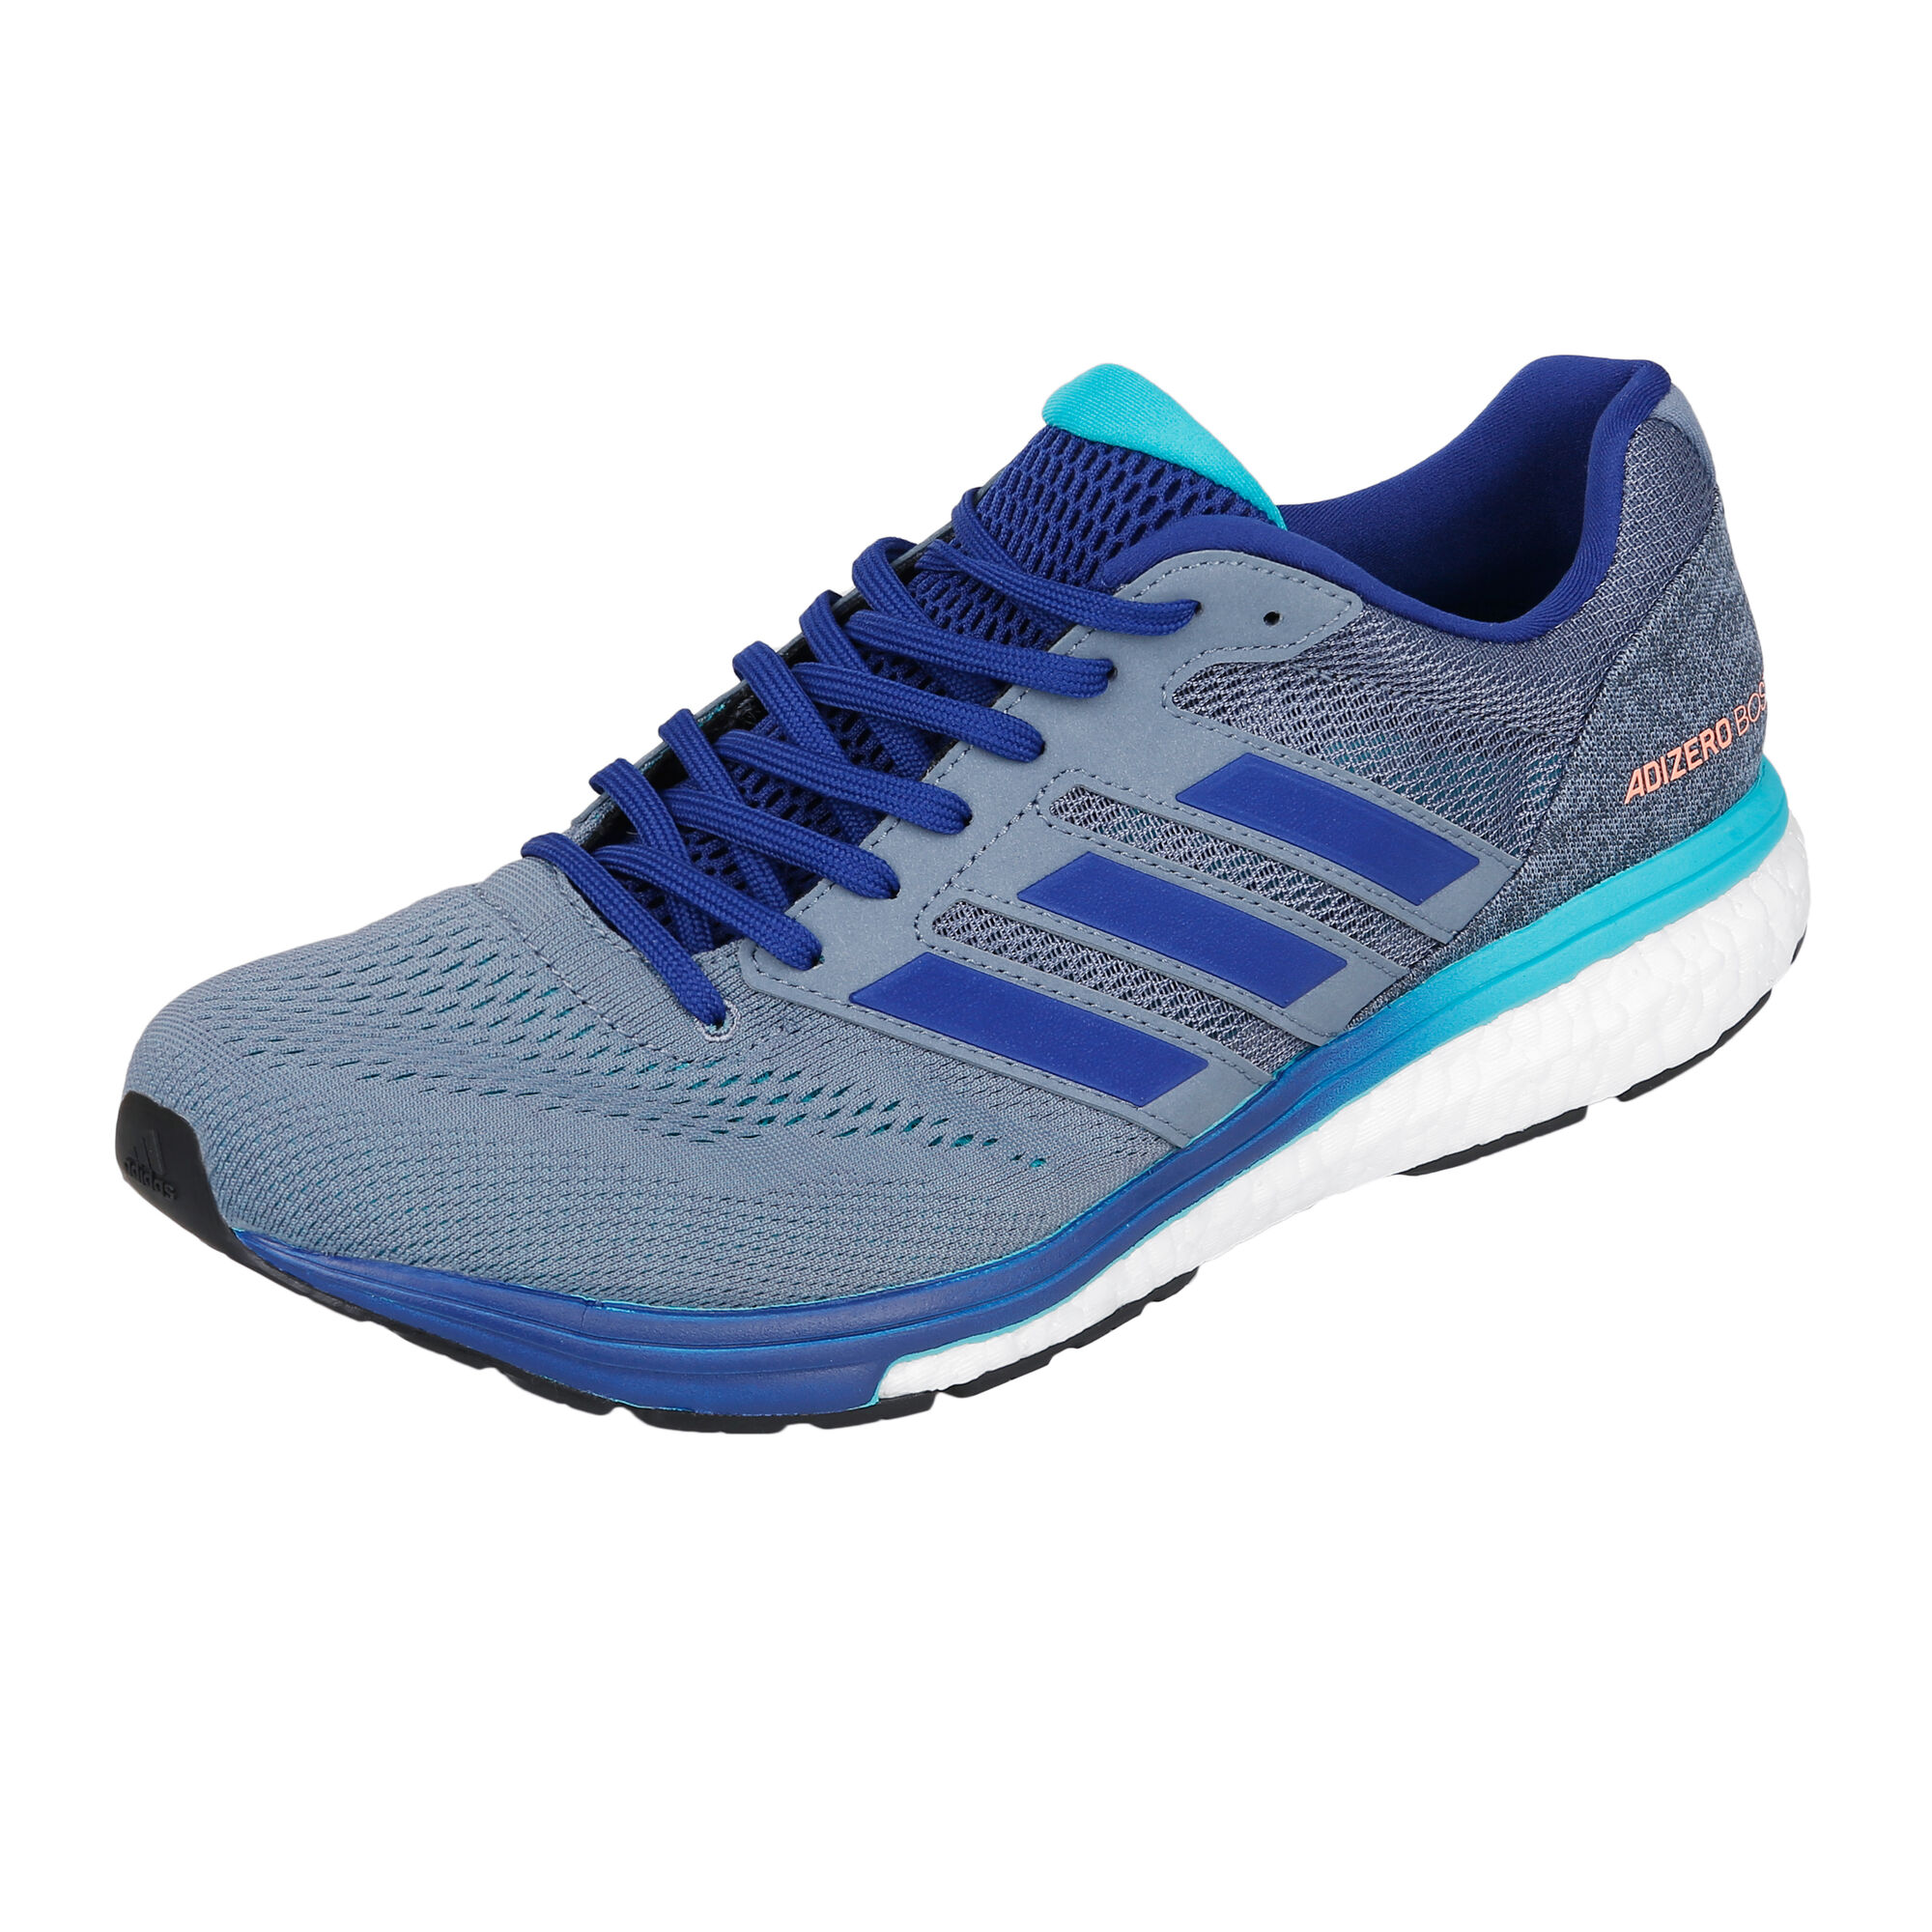 new concept 37e97 6b660 adidas · adidas · adidas · adidas · adidas · adidas · adidas · adidas ·  adidas. Adizero Boston 7 ...